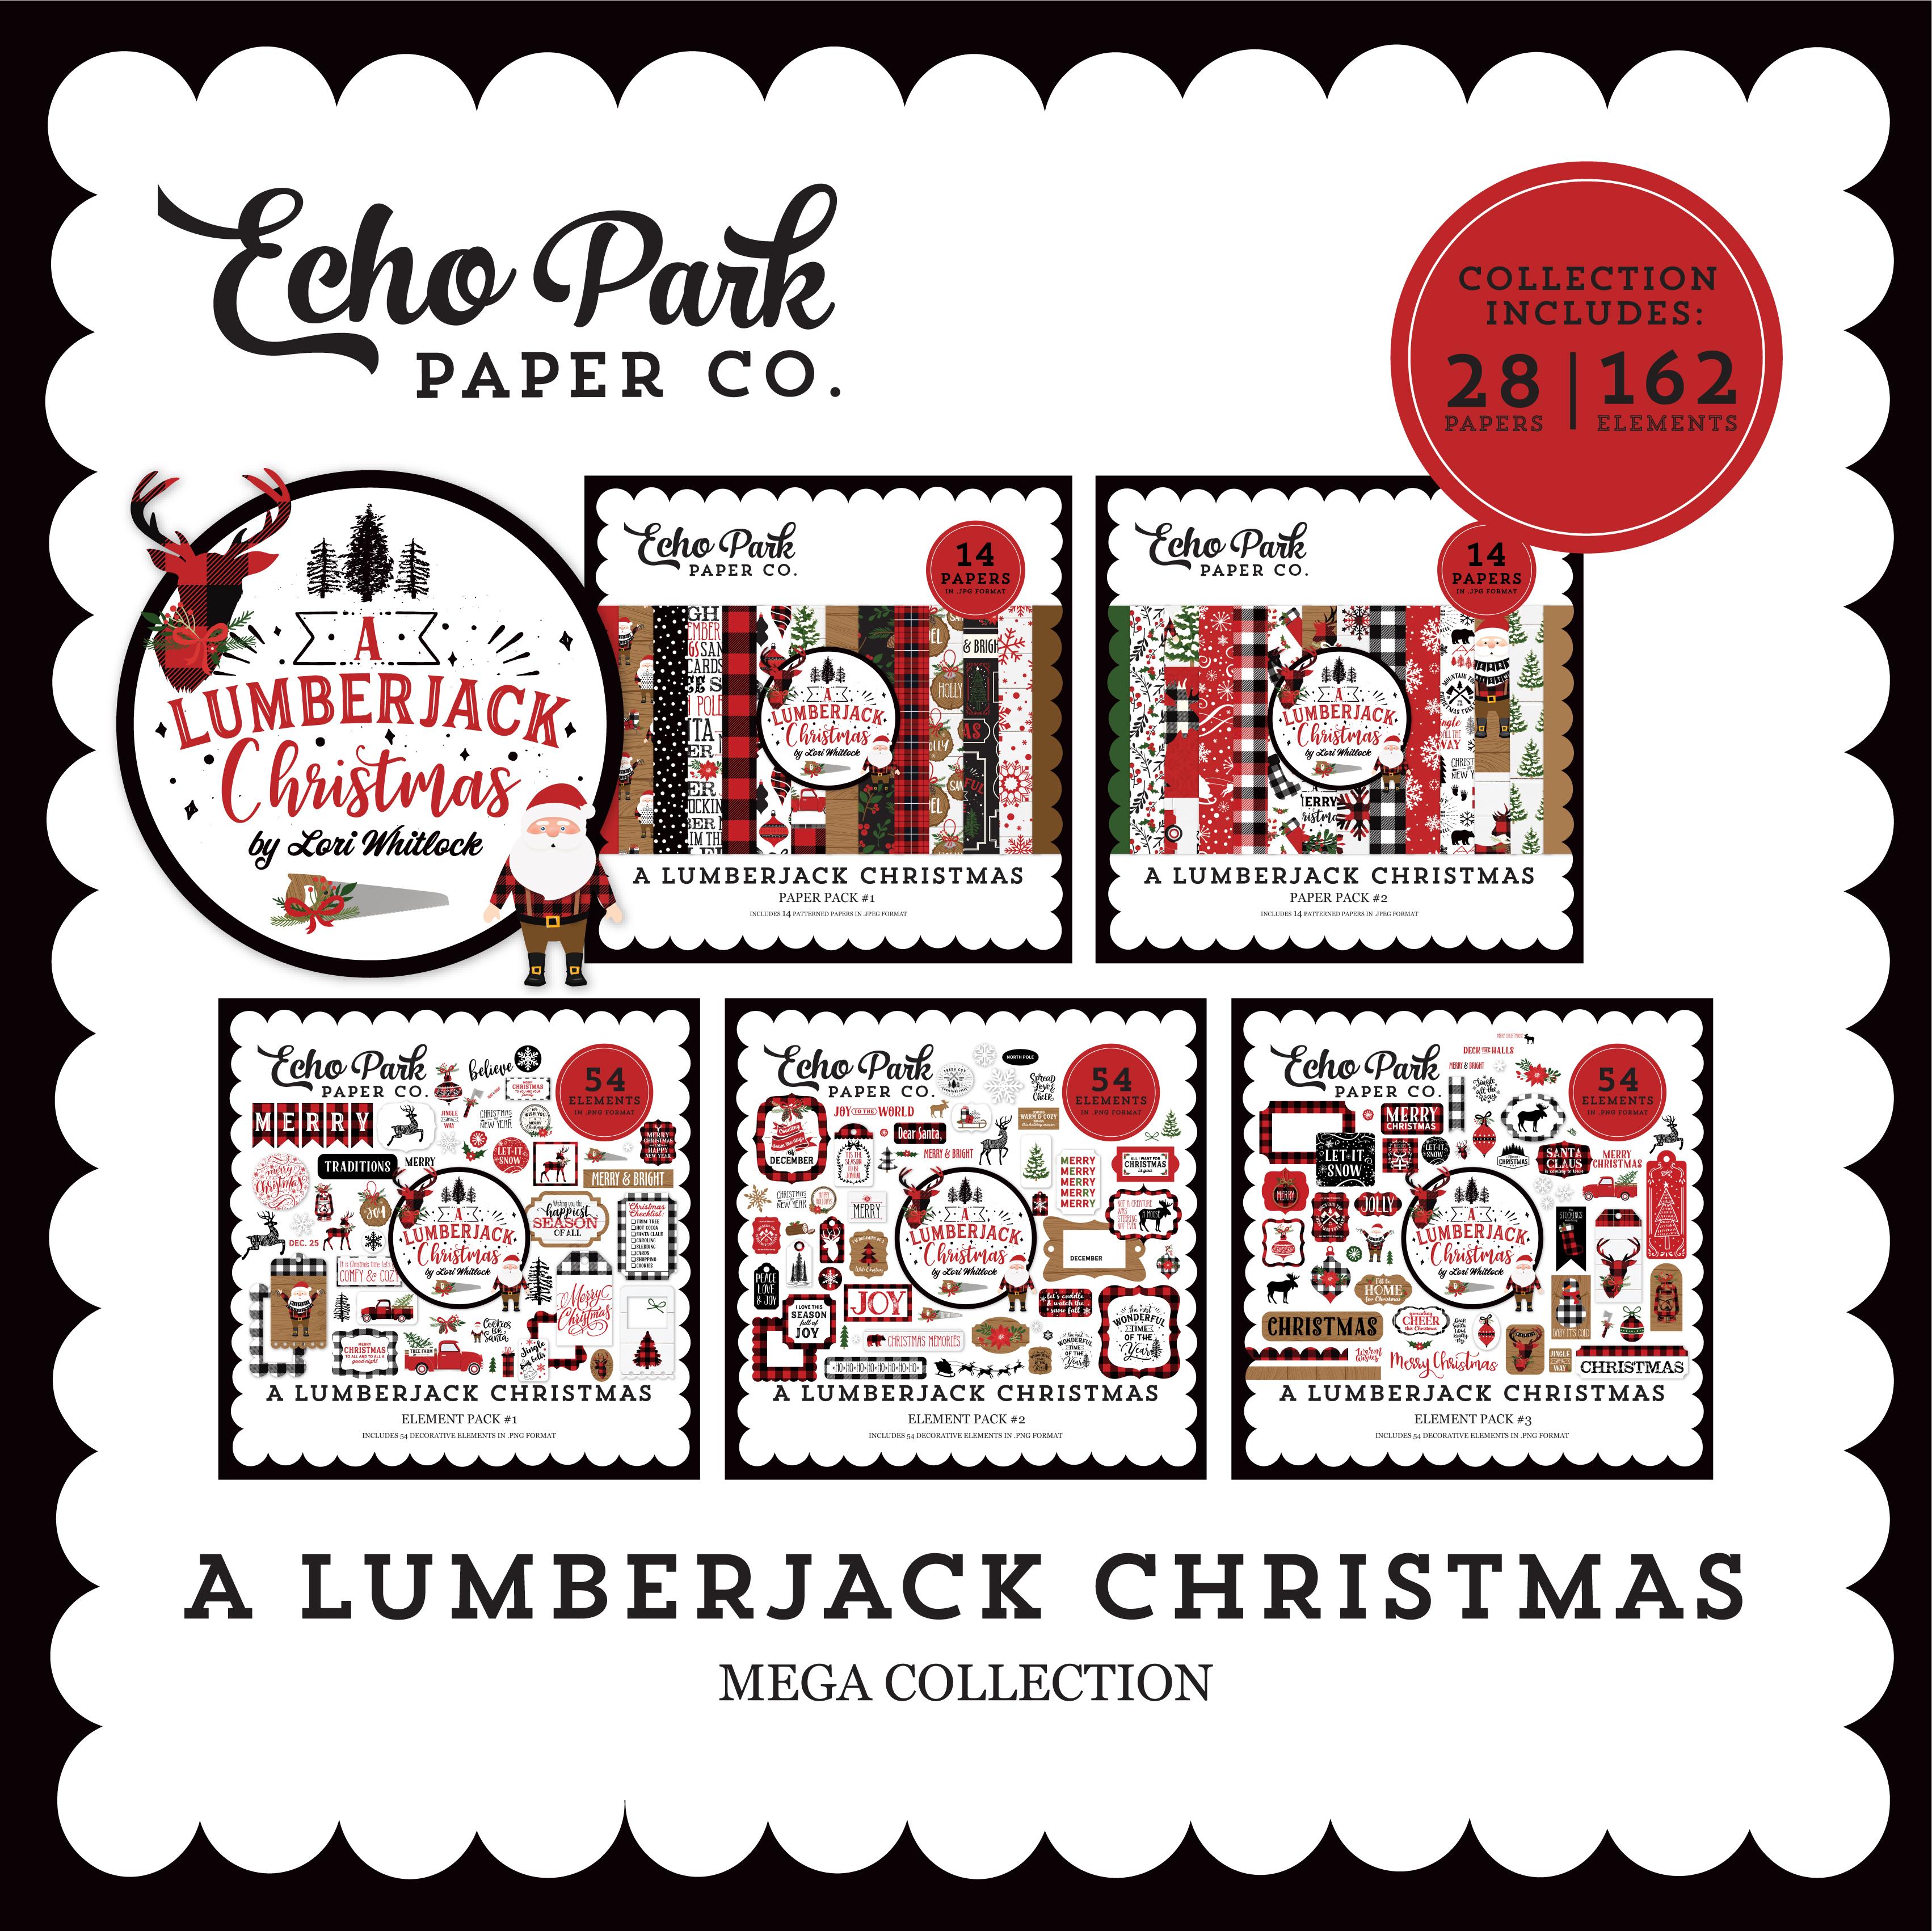 A Lumberjack Christmas Mega Collection